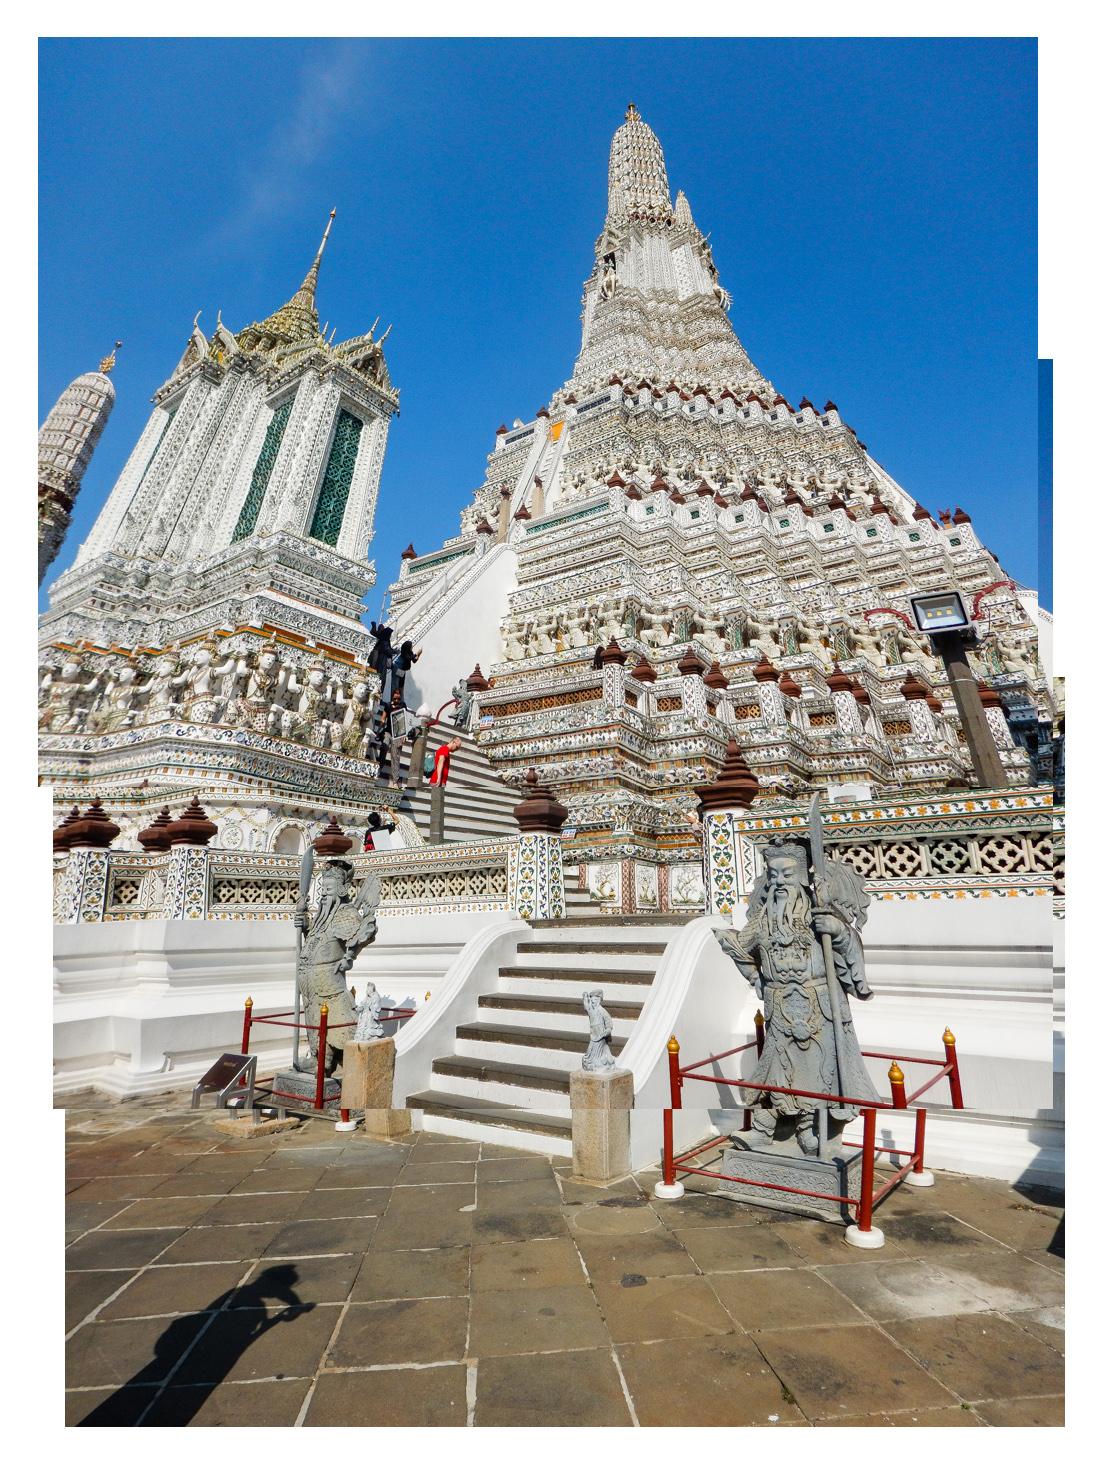 bangkok_temple2_pano.jpg